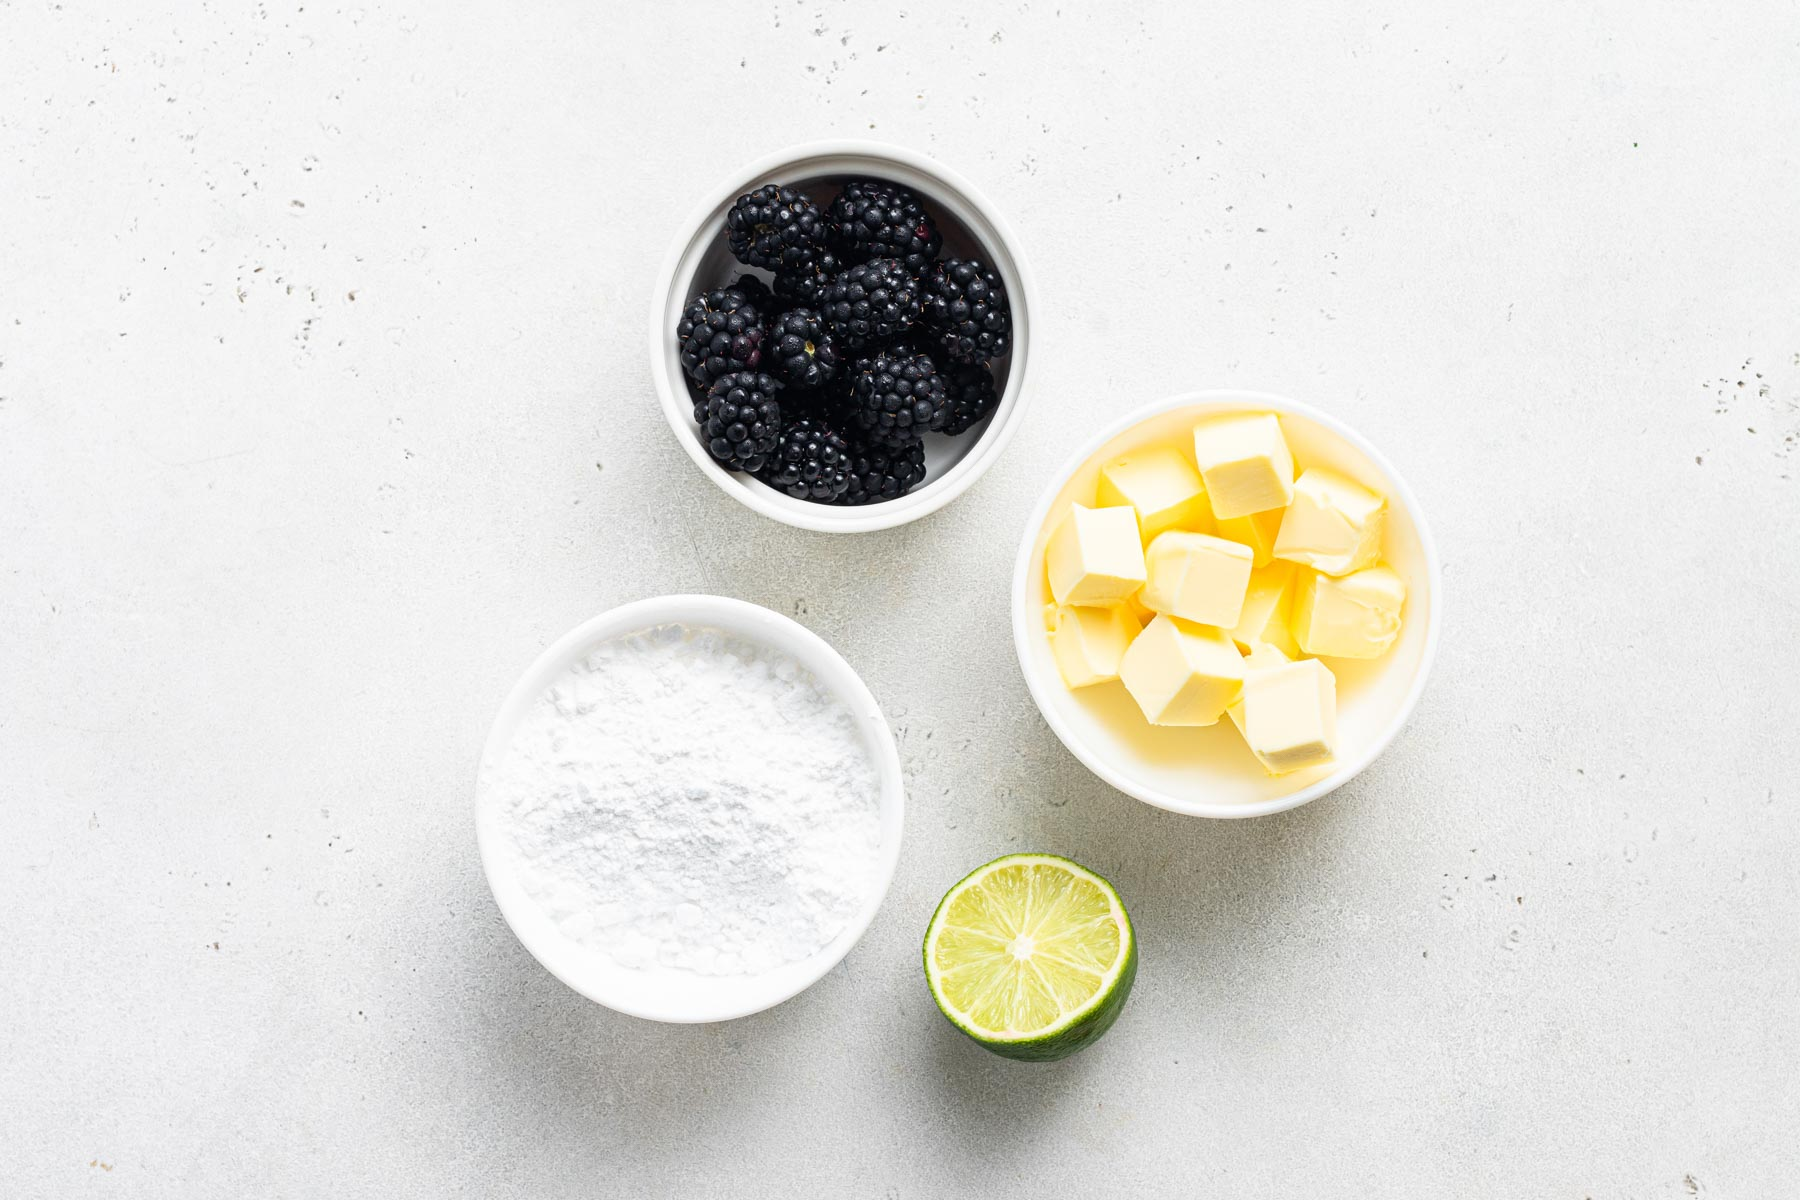 Ingredients for blackberry buttercream.